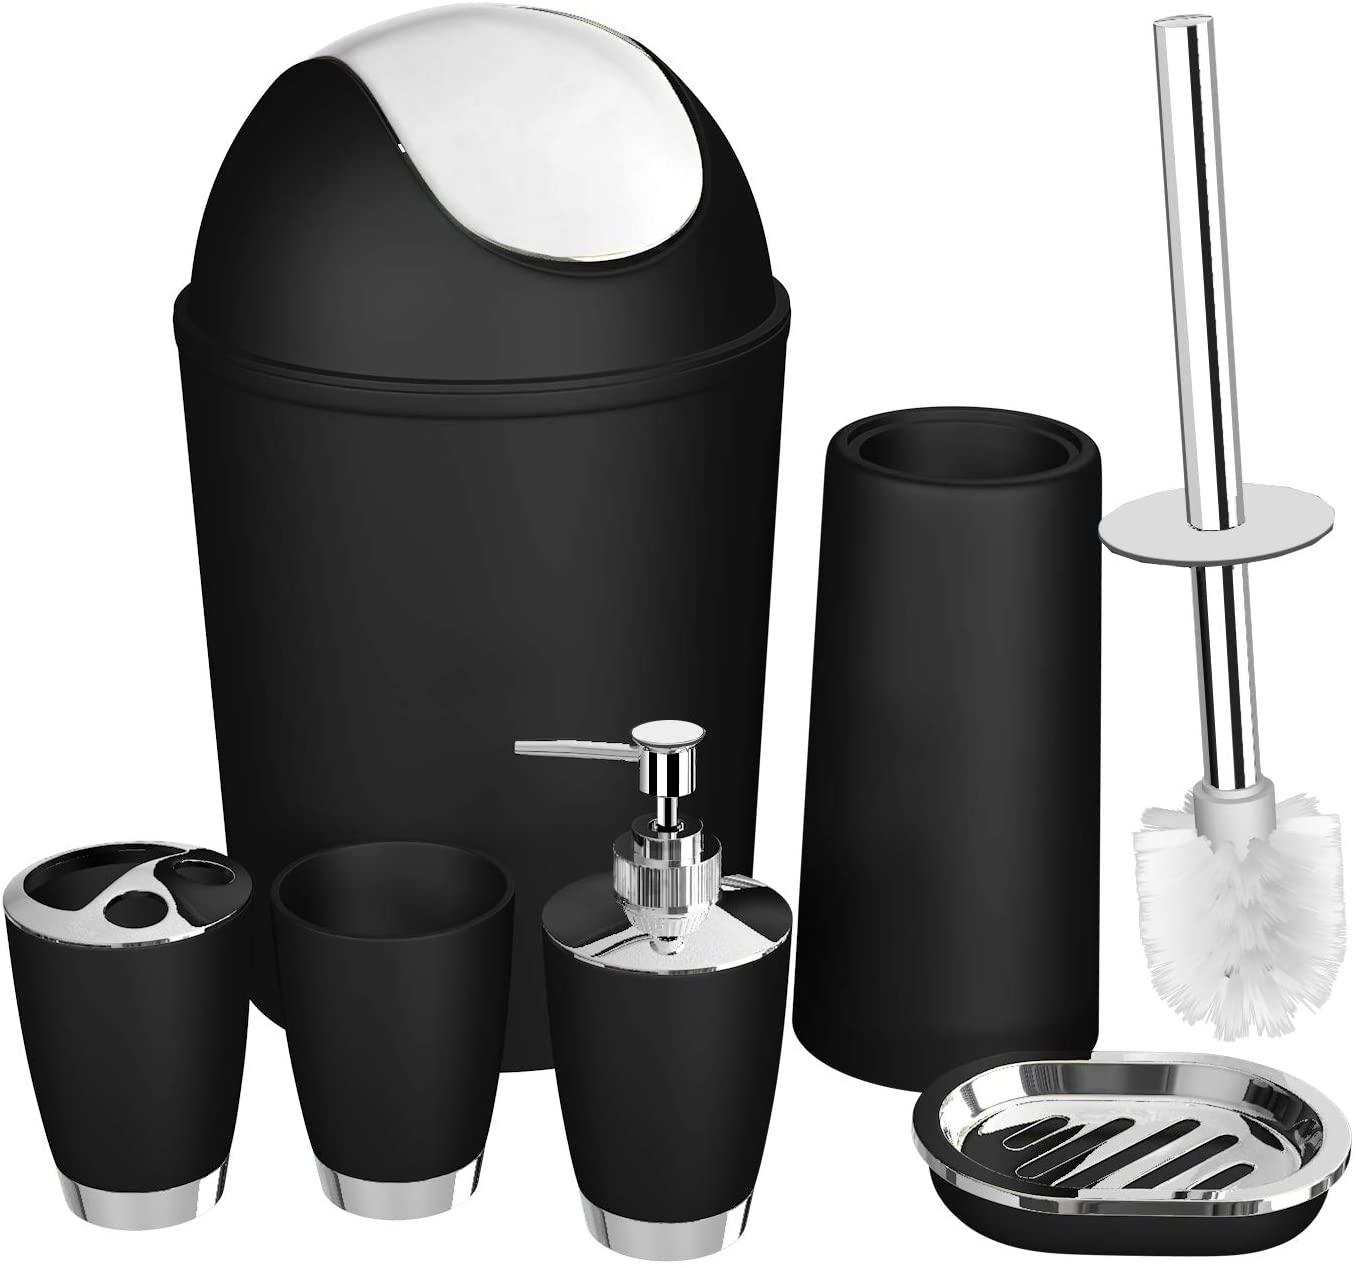 SOELAND Bathroom Accessories Set,6 Pcs Plastic Gift Set Toothbrush Holder,Toothbrush Cup,Soap Dispenser,Soap Dish,Toilet Brush Holder,Trash Can,Tumbler Straw Set Bathroom